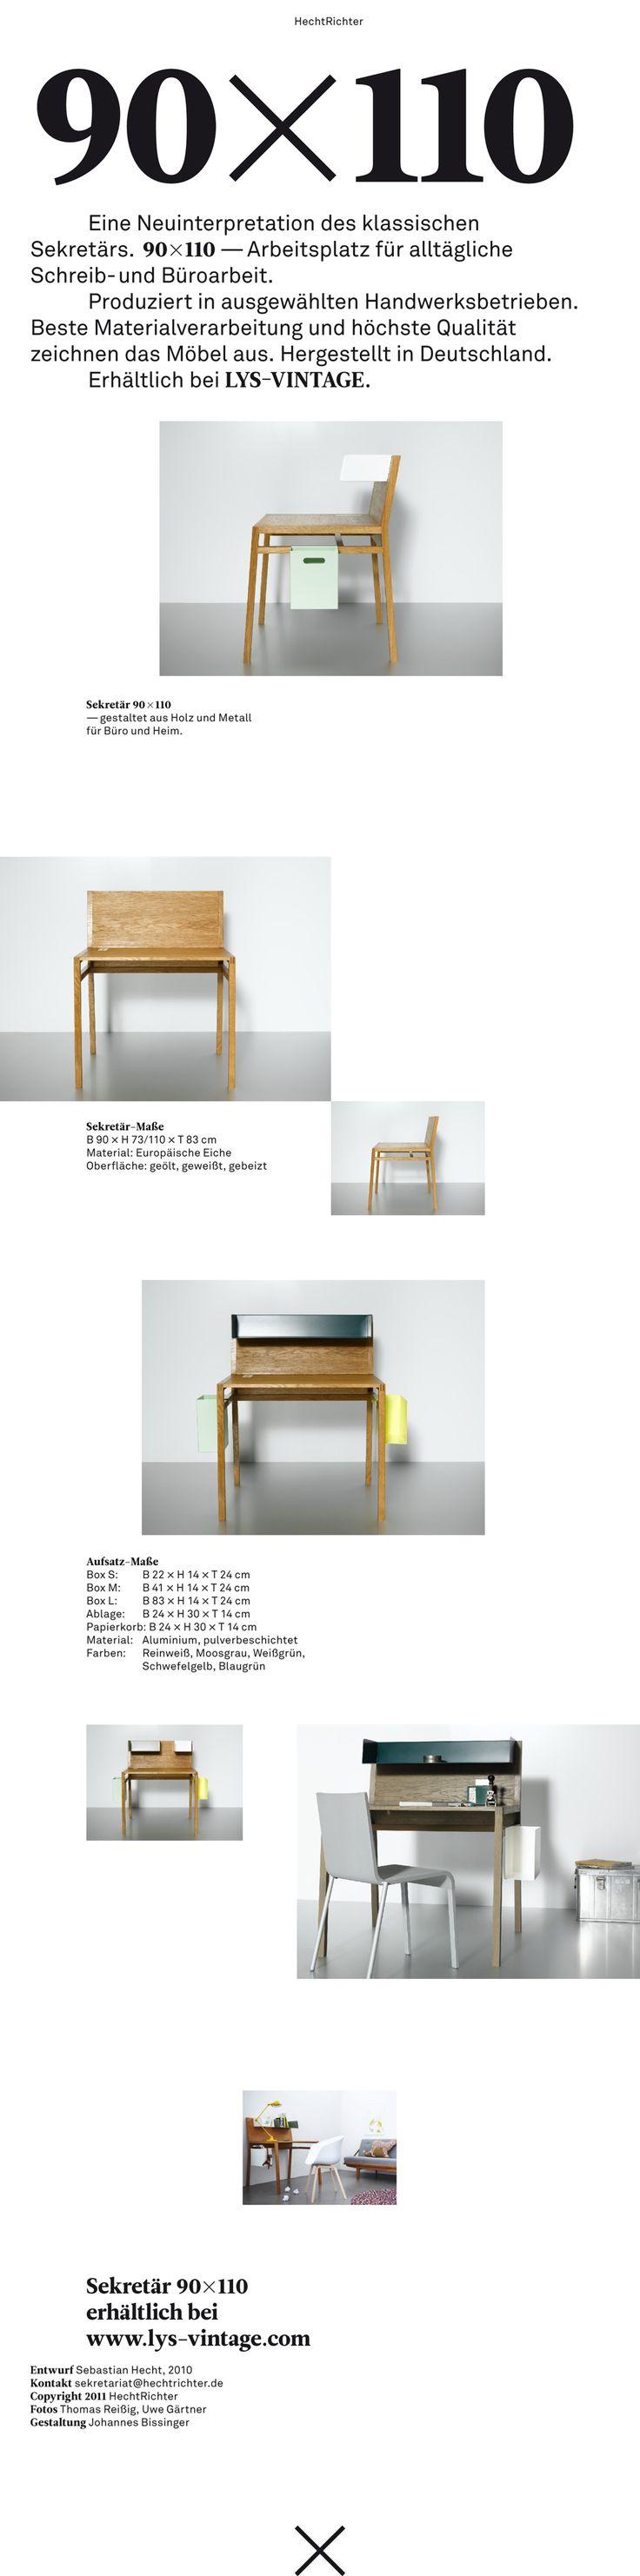 Car Möbel Sekretär | Badezimmer, Schlafzimmer, Sessel & Möbel Design ...